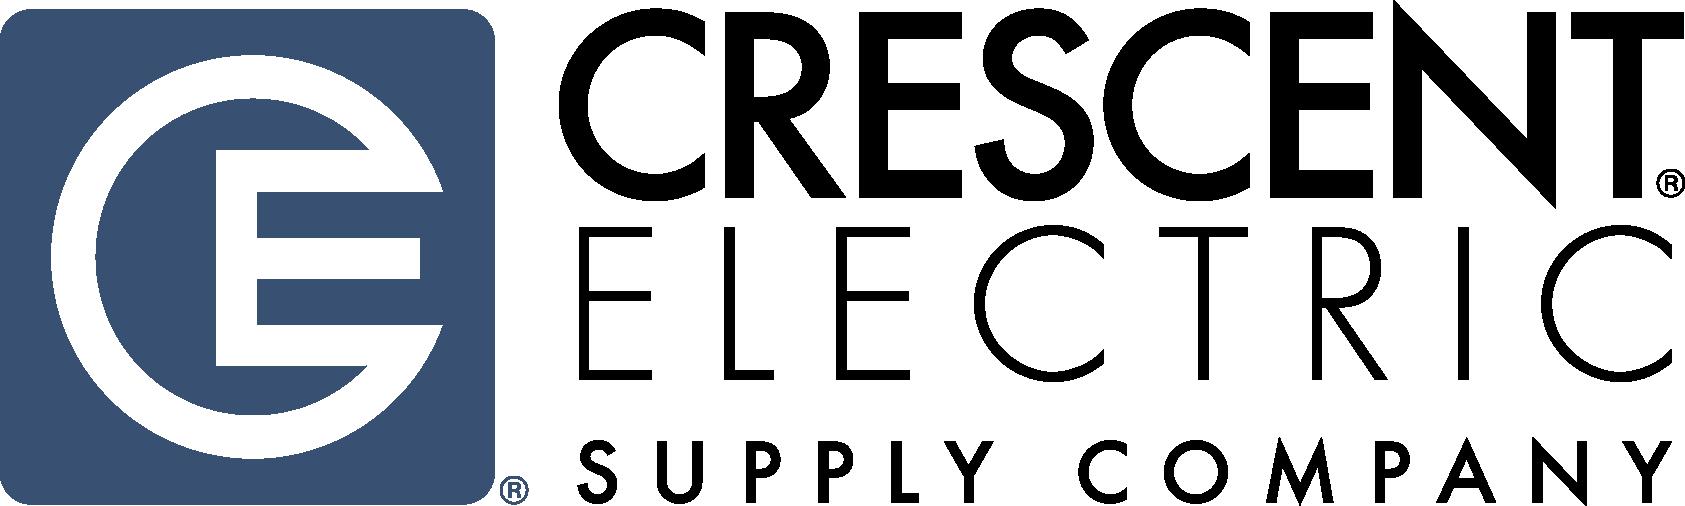 crescent company logo